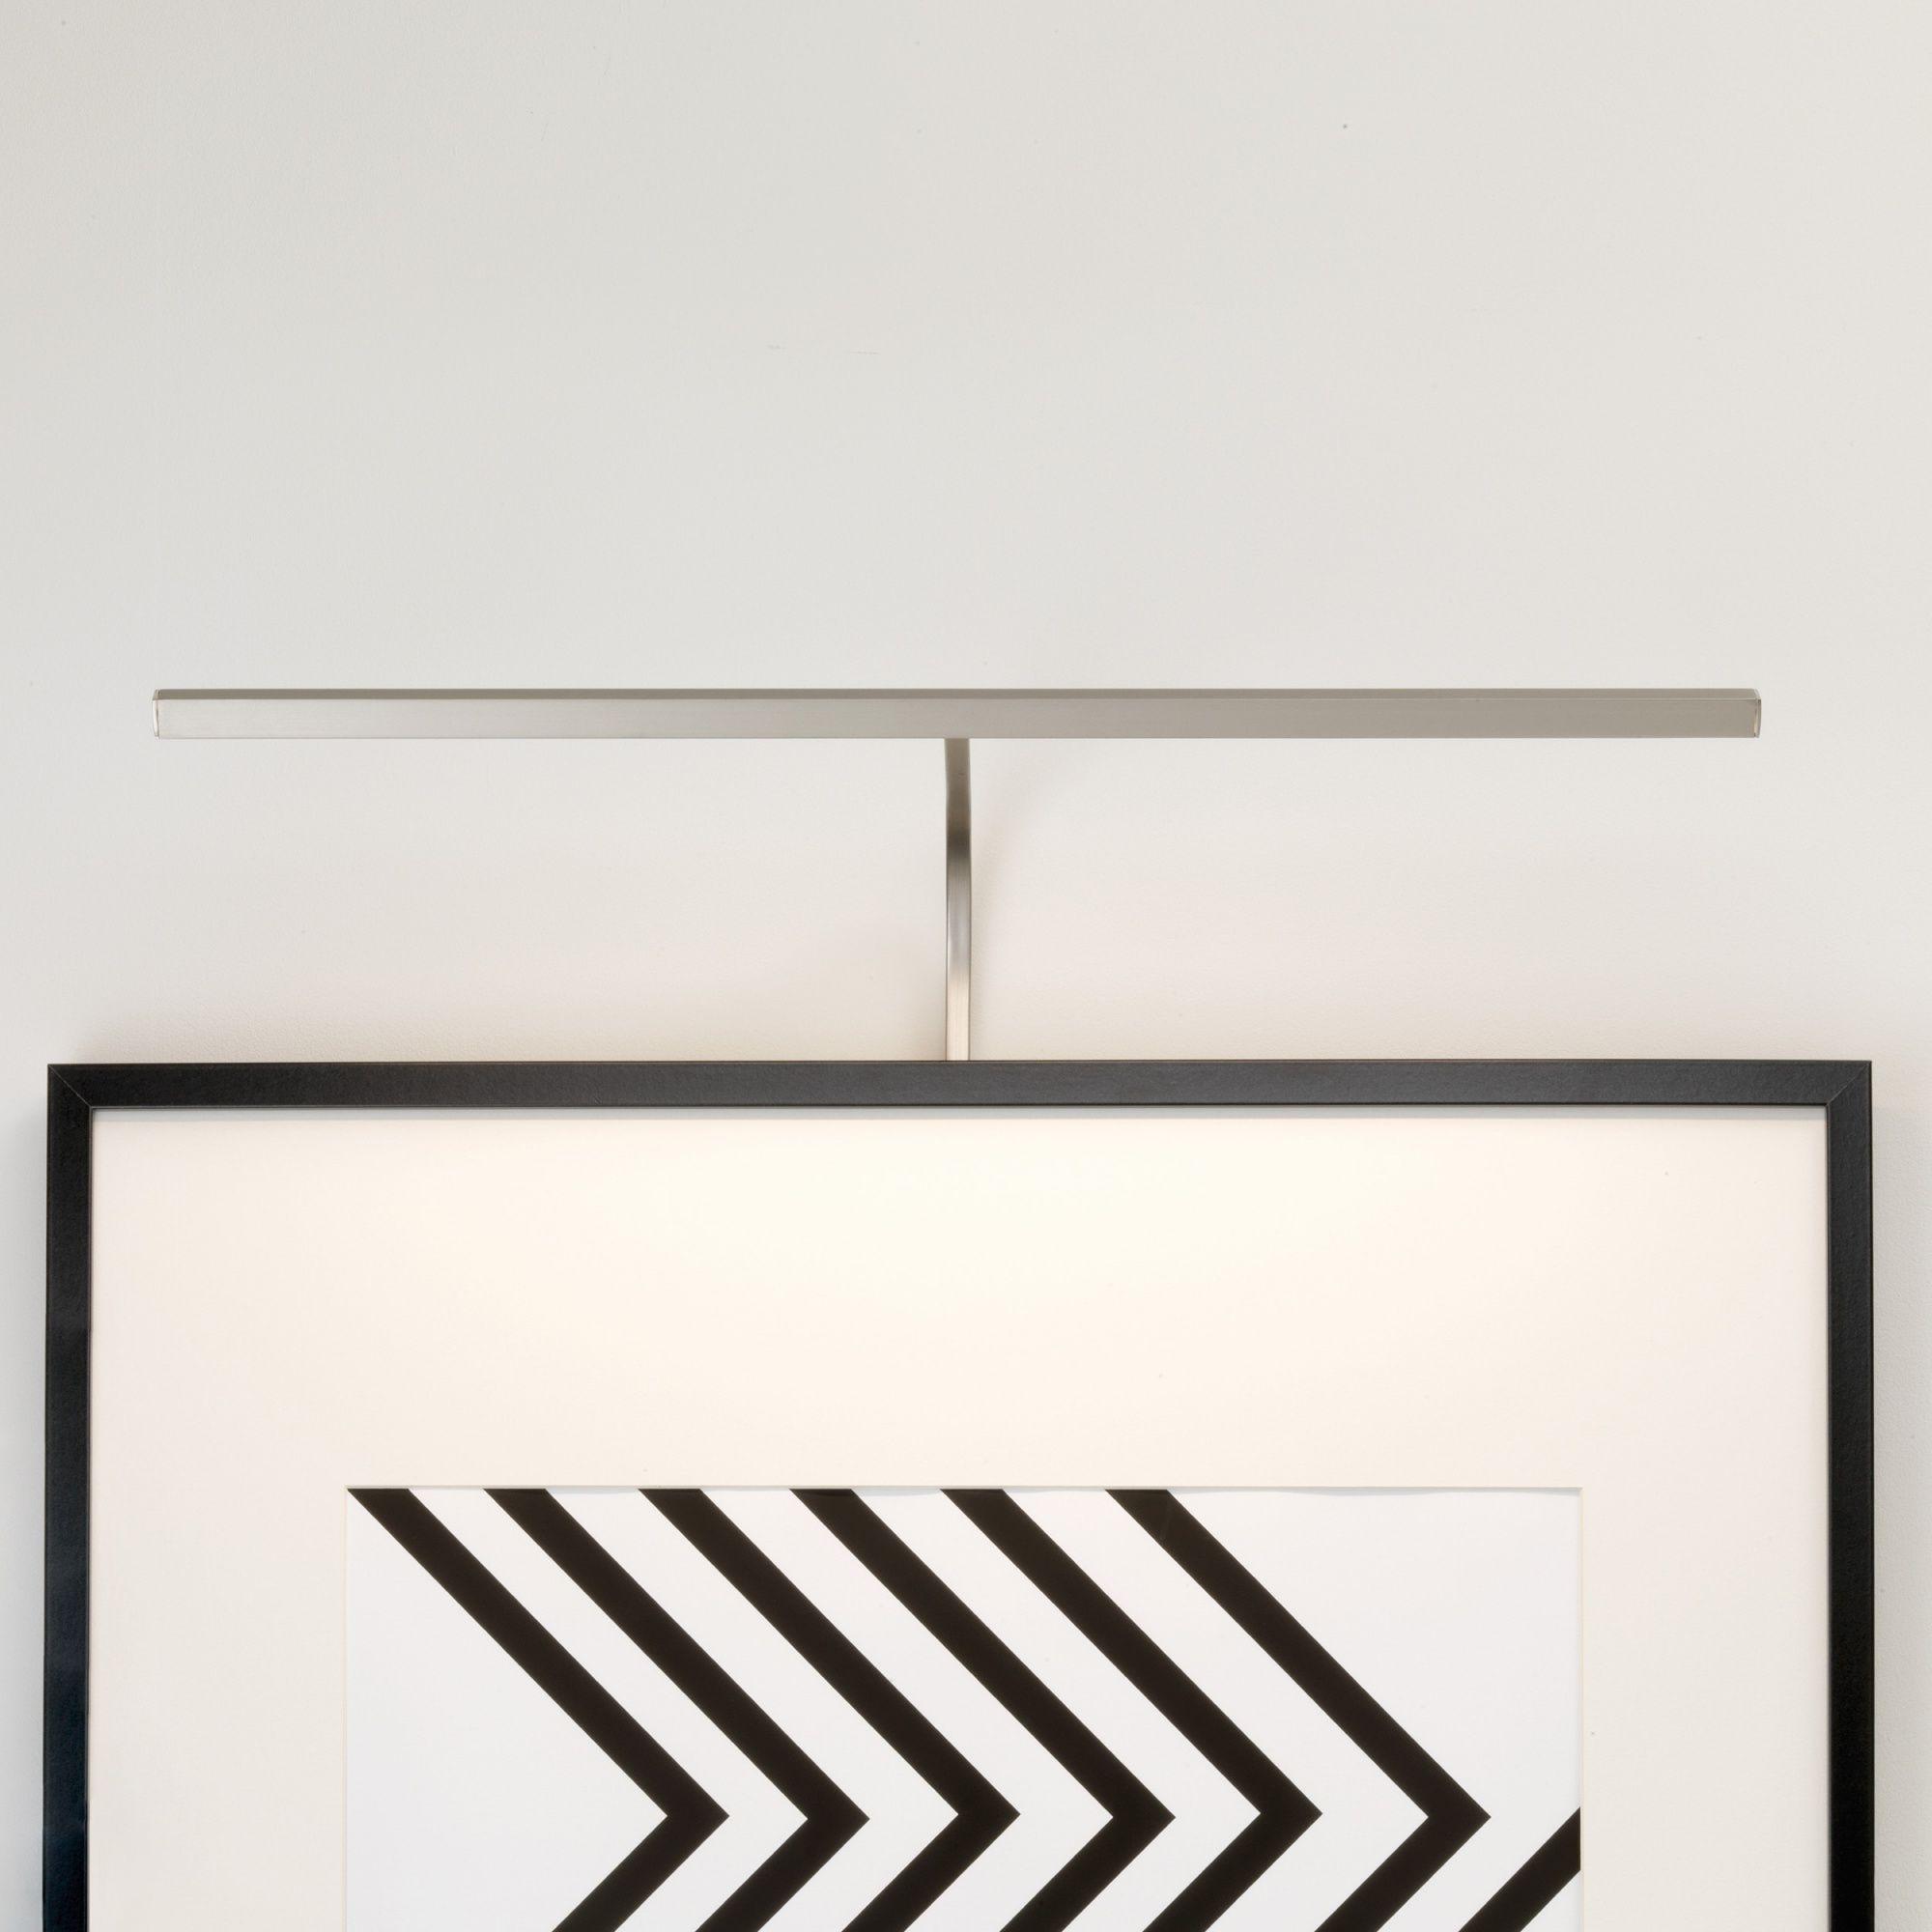 Kinkiet nad obrazy Mondrian 600 7889 Astro Lighting